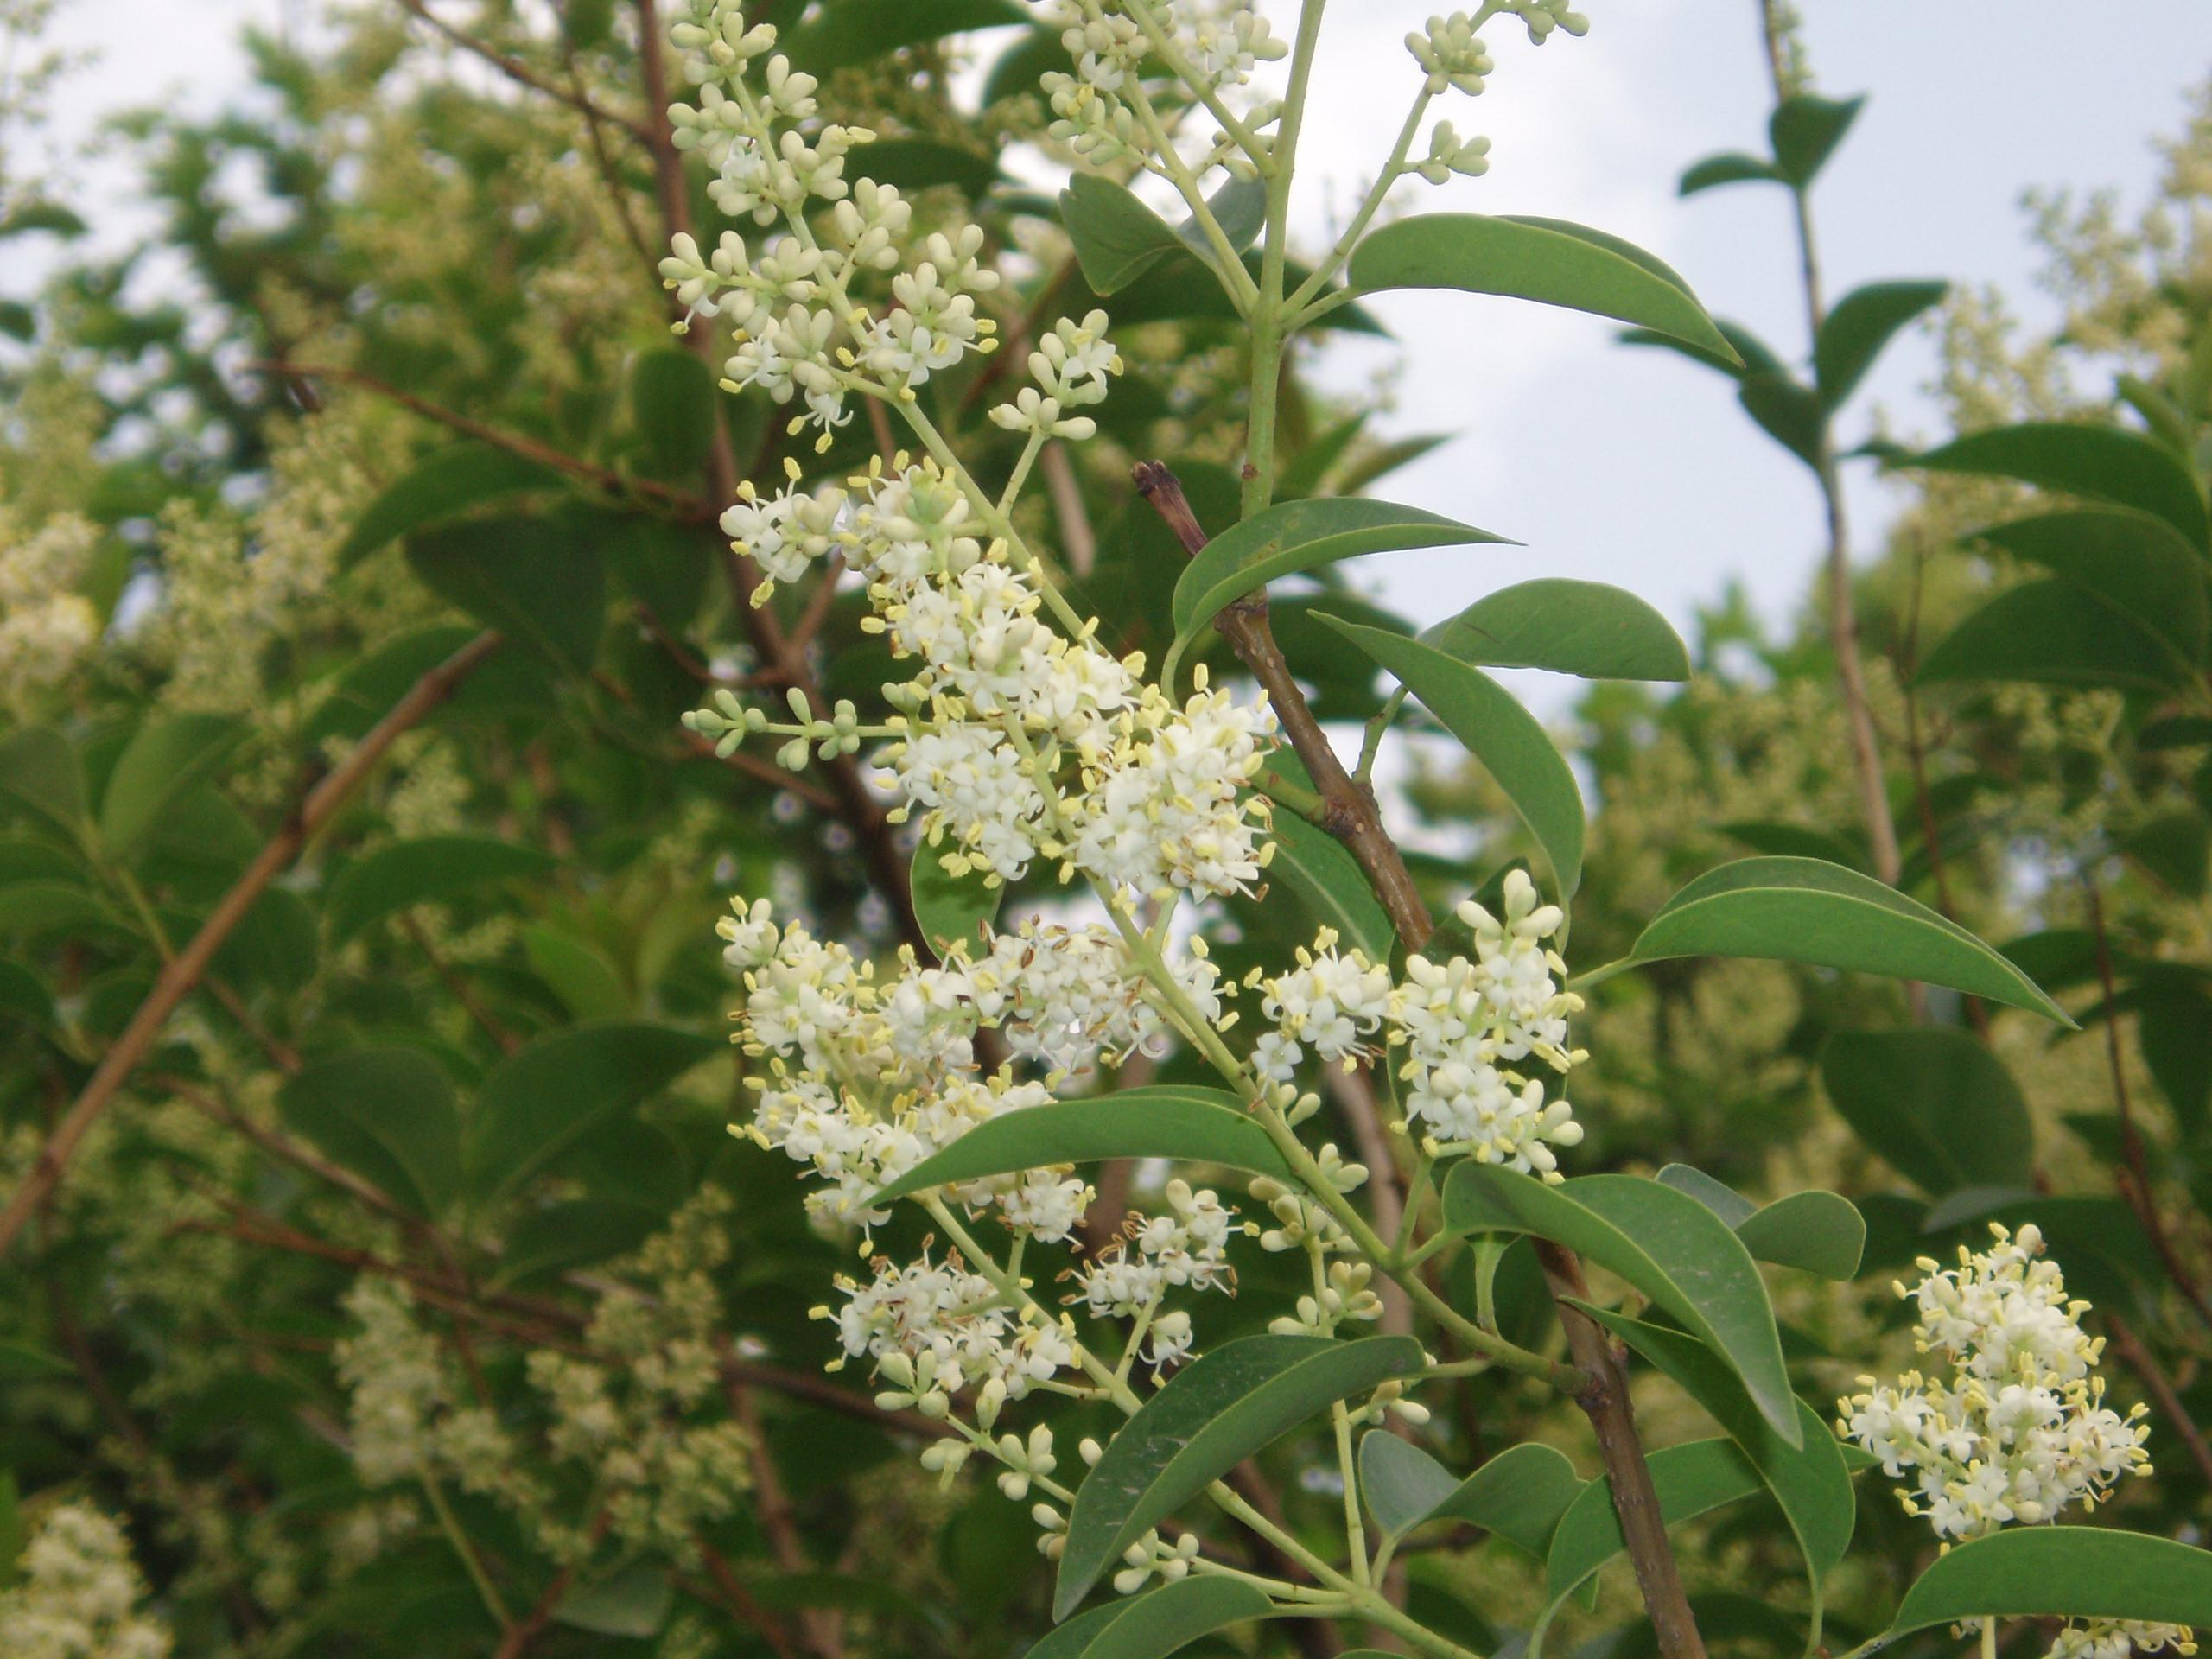 Haie De Troene Jardin : Ligustrum lucidum glossy privet